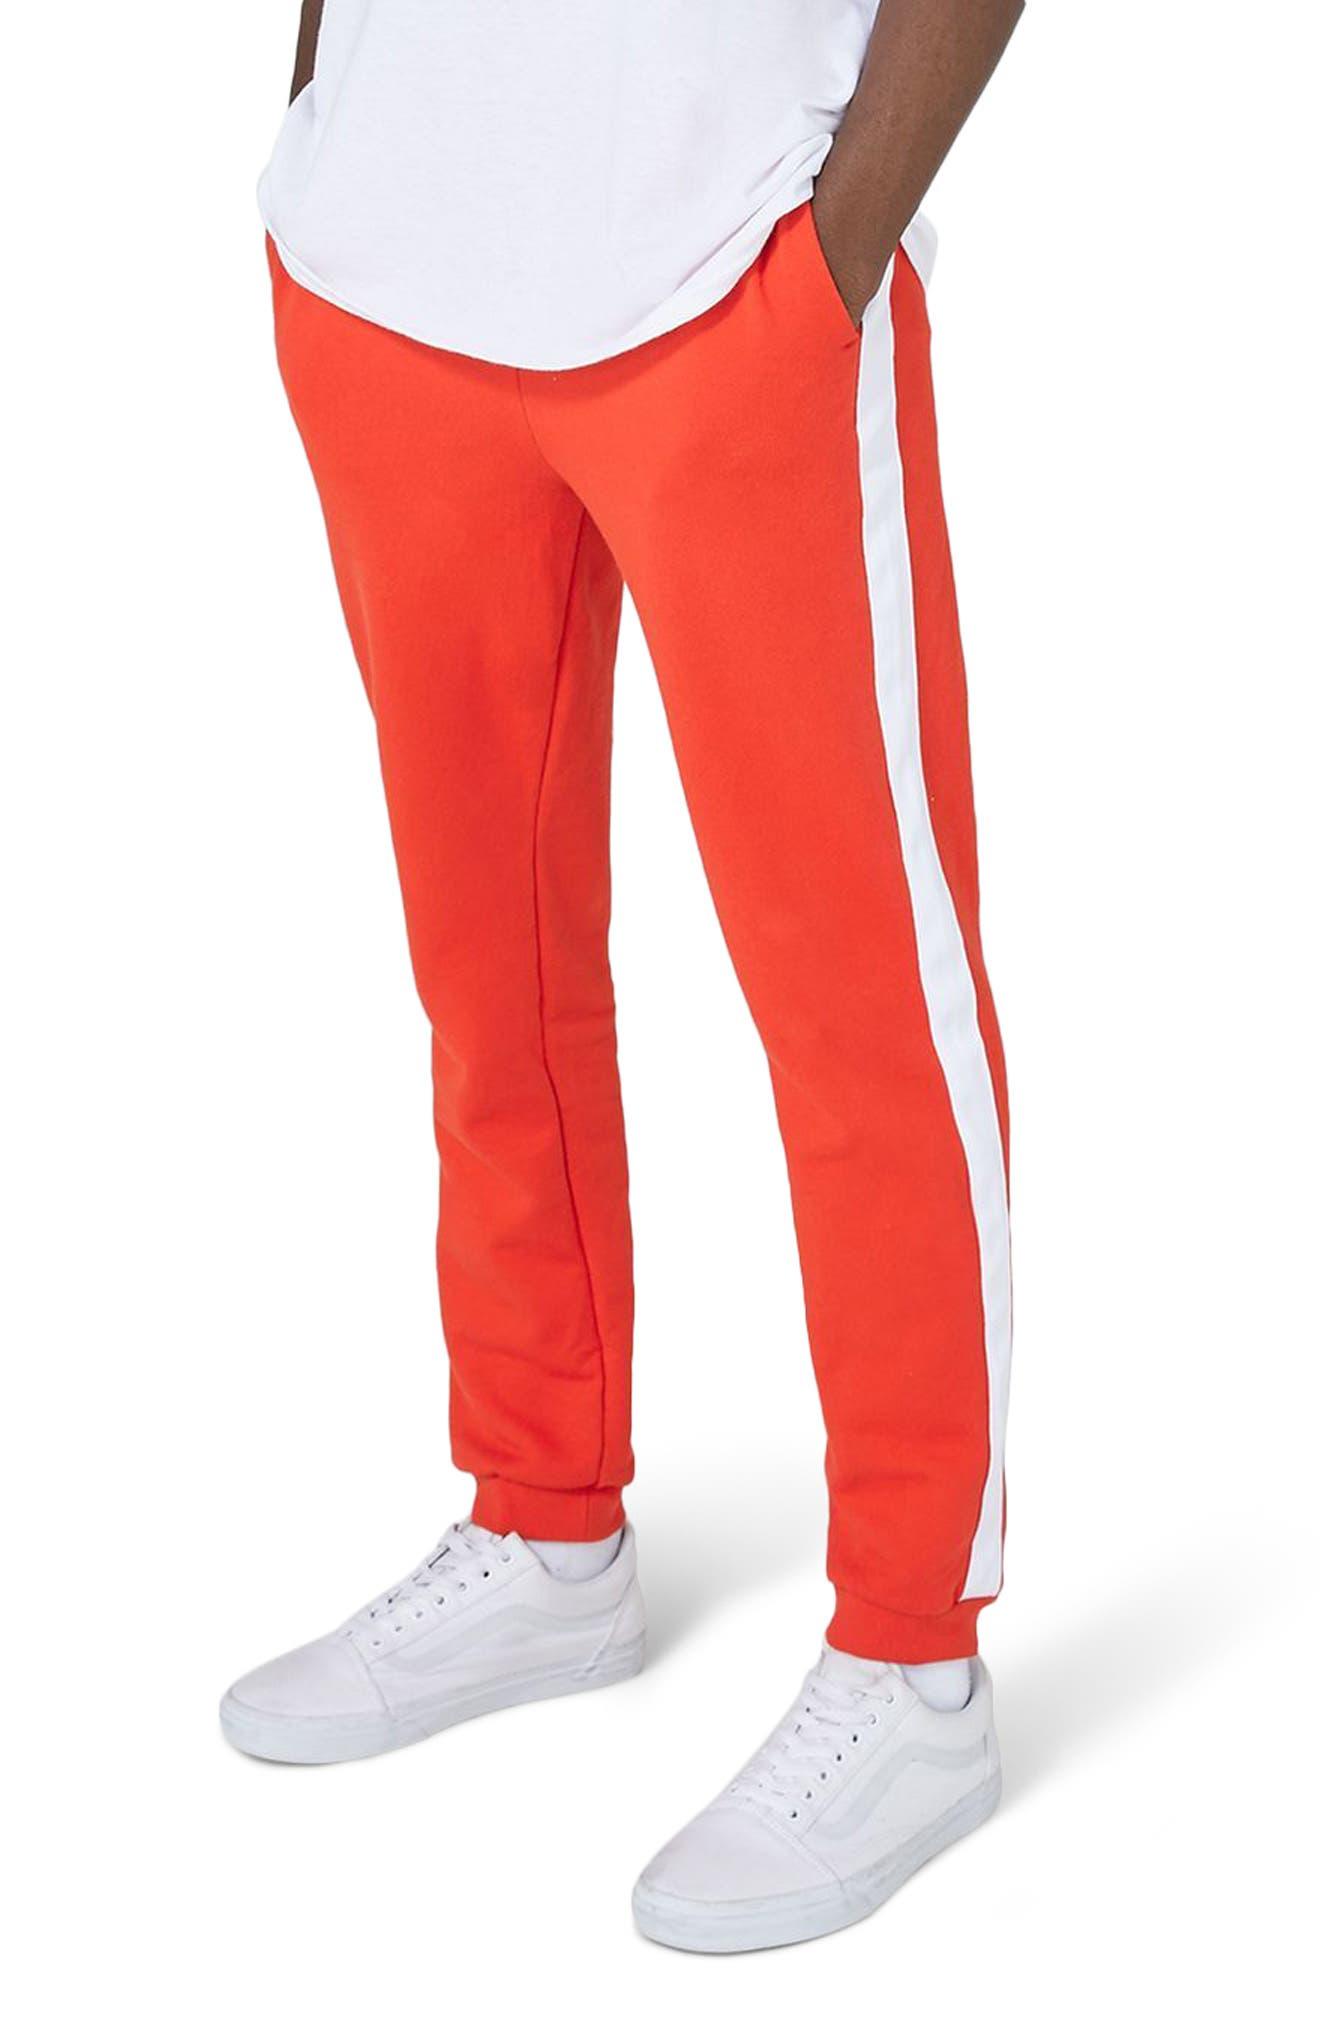 Topman Side Tape Skinny Fit Jogger Pants